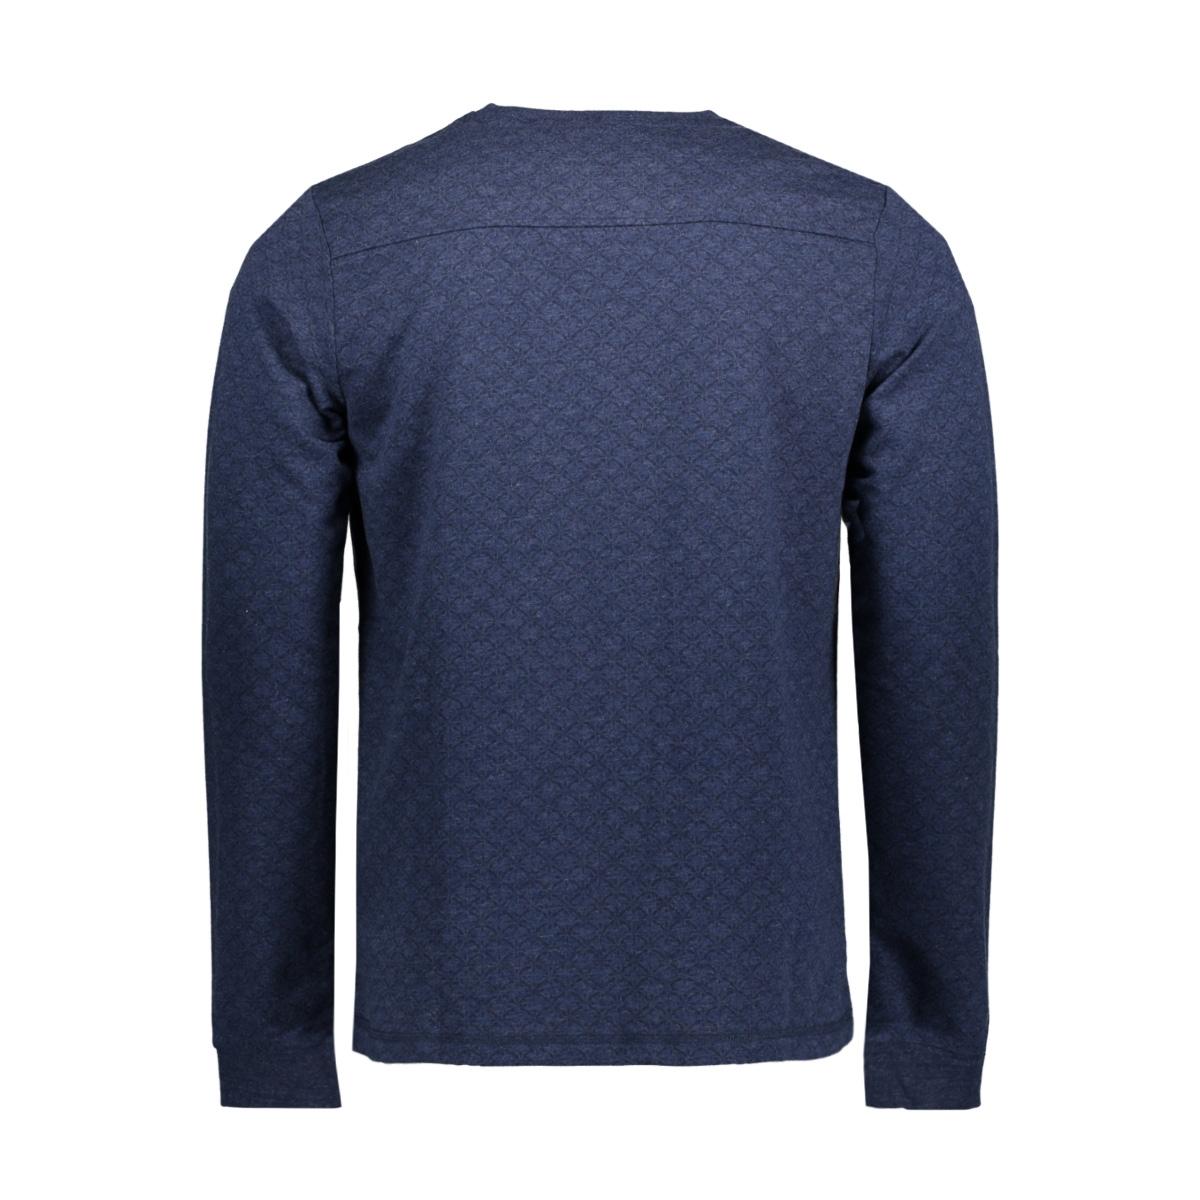 mls751803 twinlife t-shirt carbon